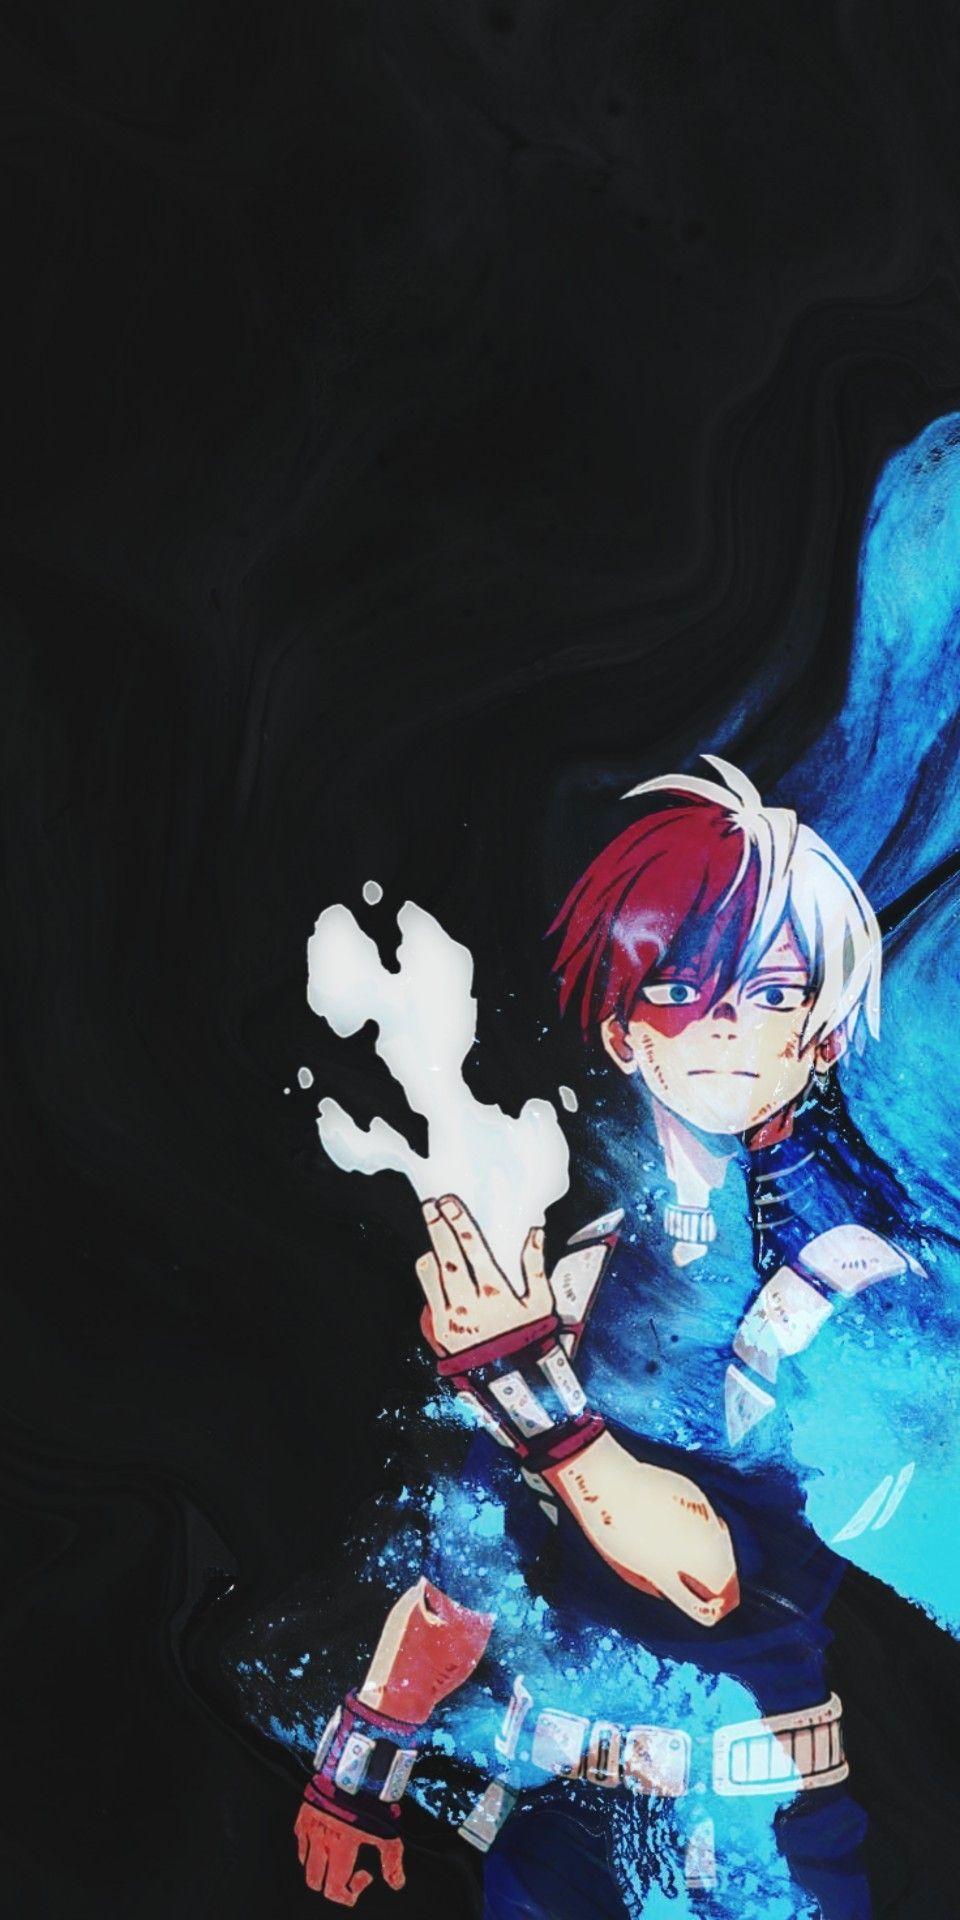 Todoroki Wallpaper In 2020 Hero Wallpaper Anime Boyfriend Anime